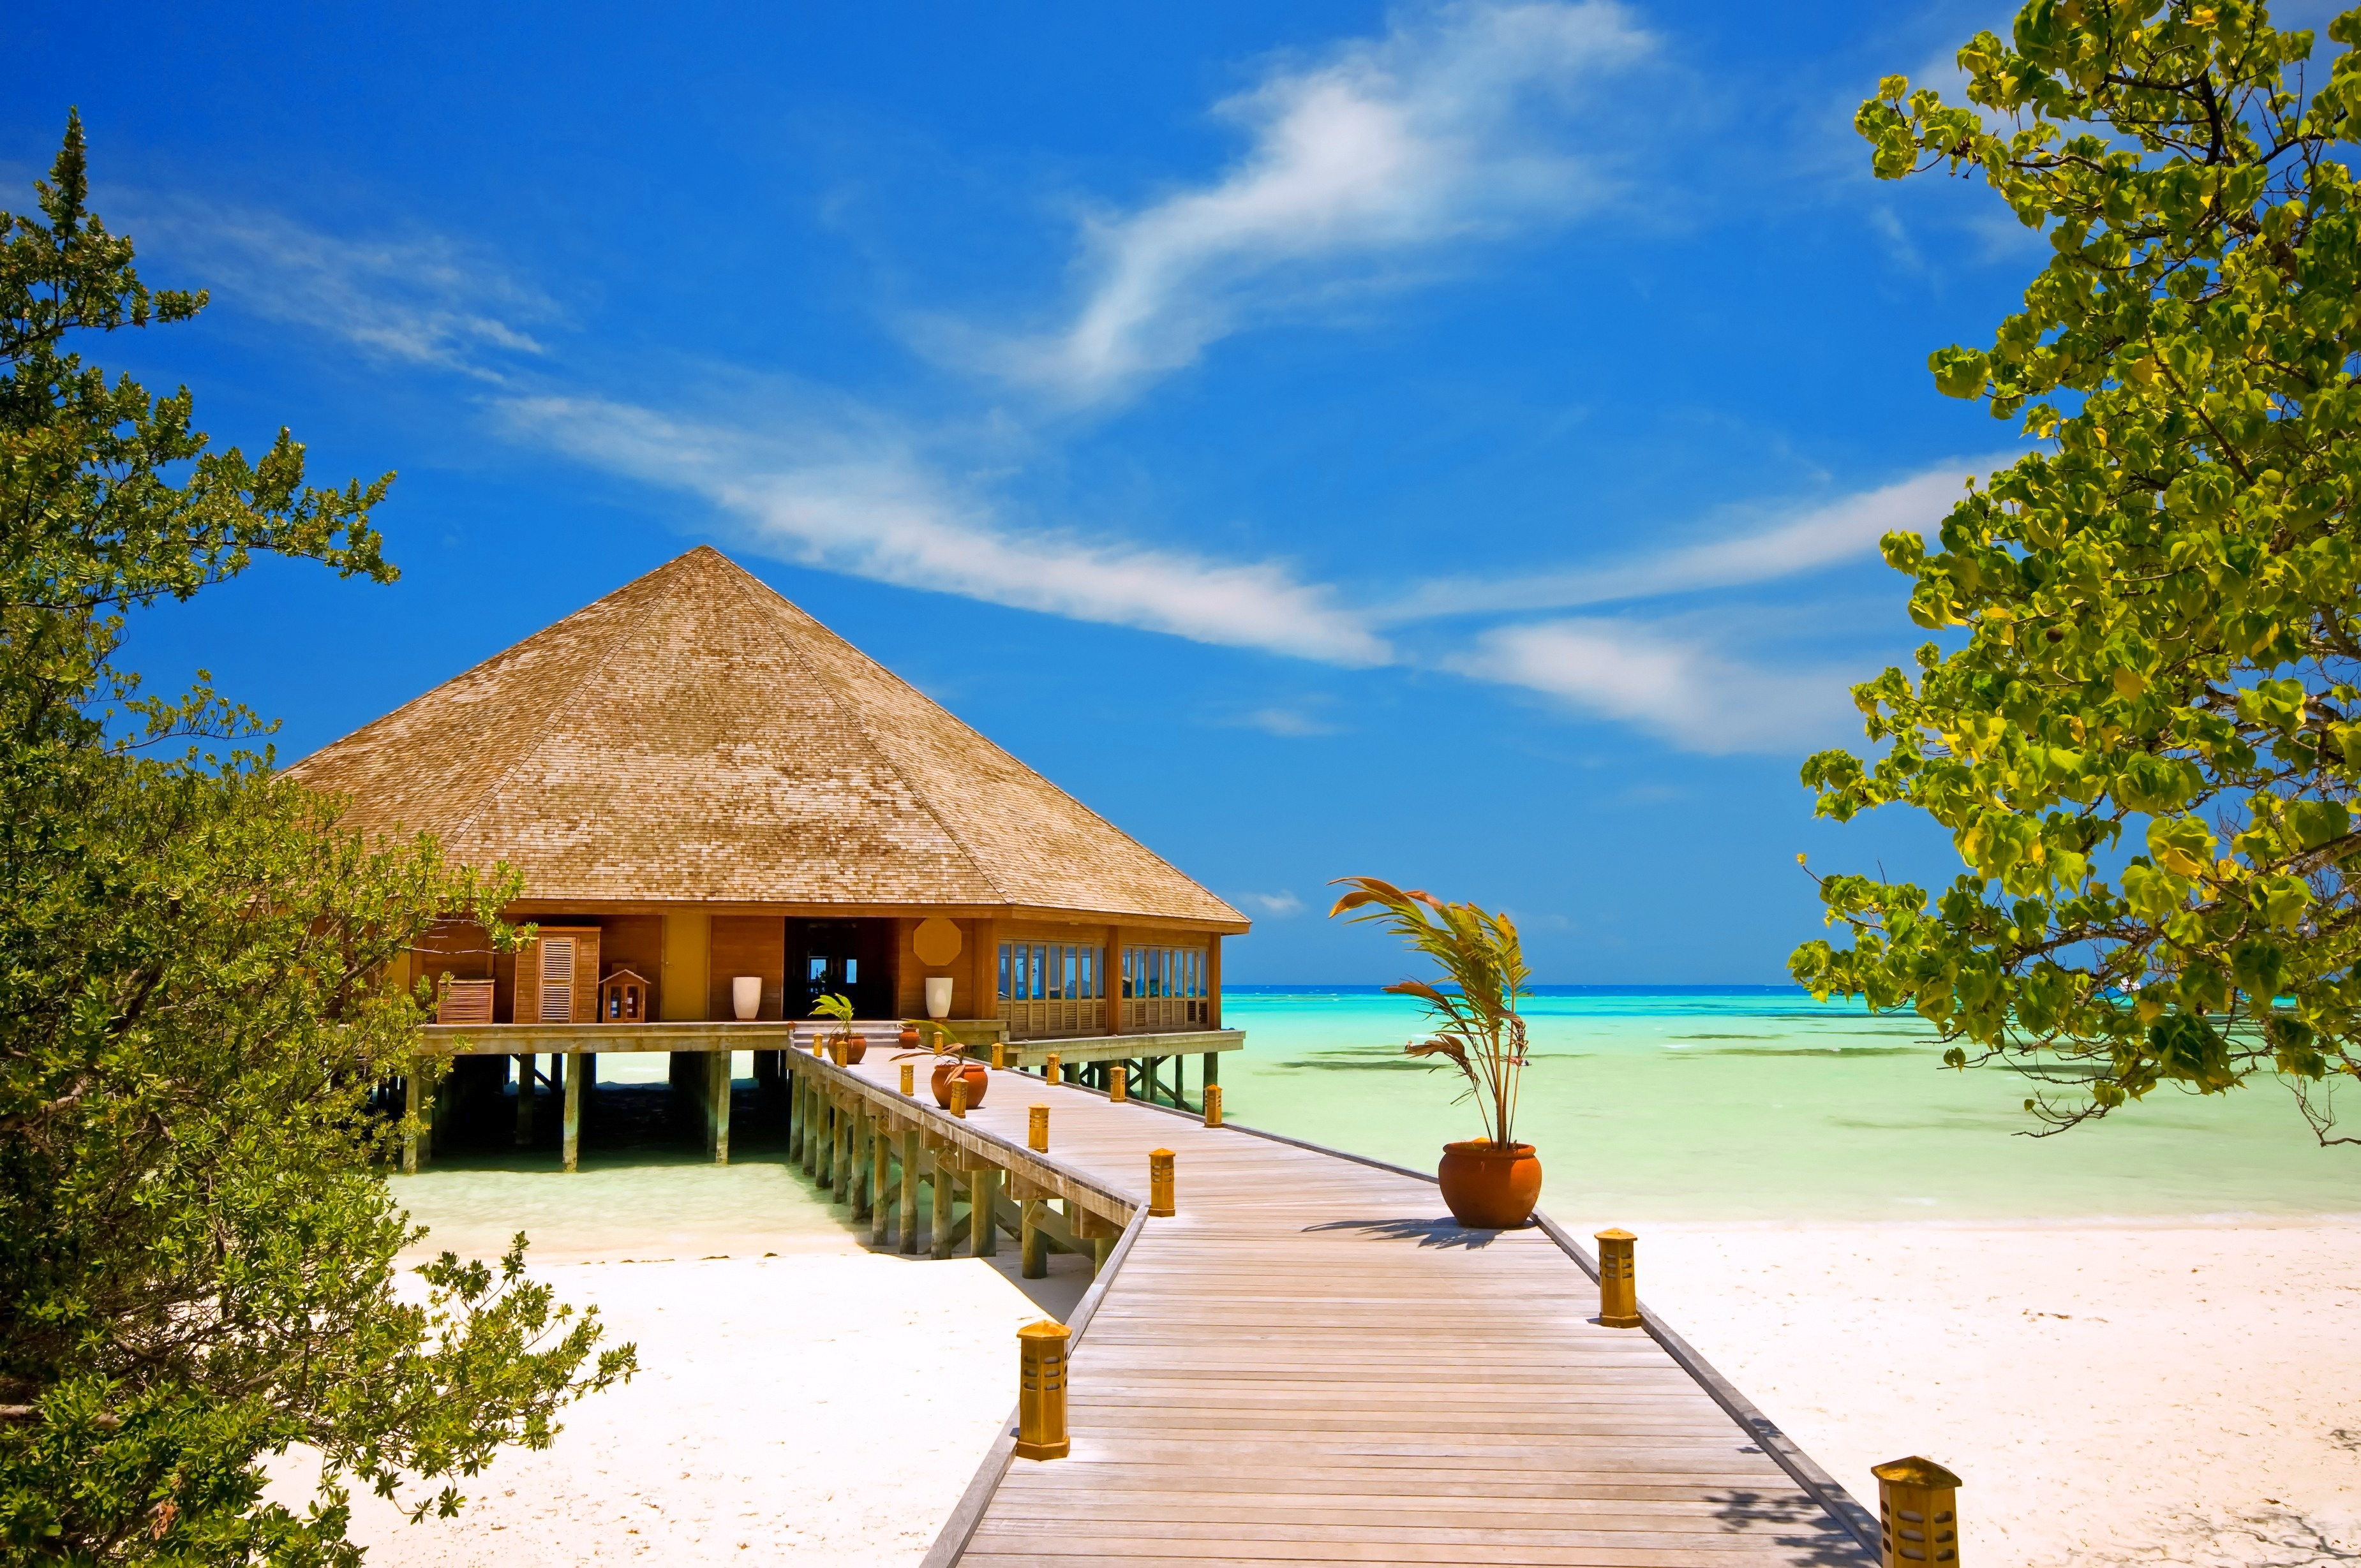 море отдых курорт дома  № 1447313 бесплатно